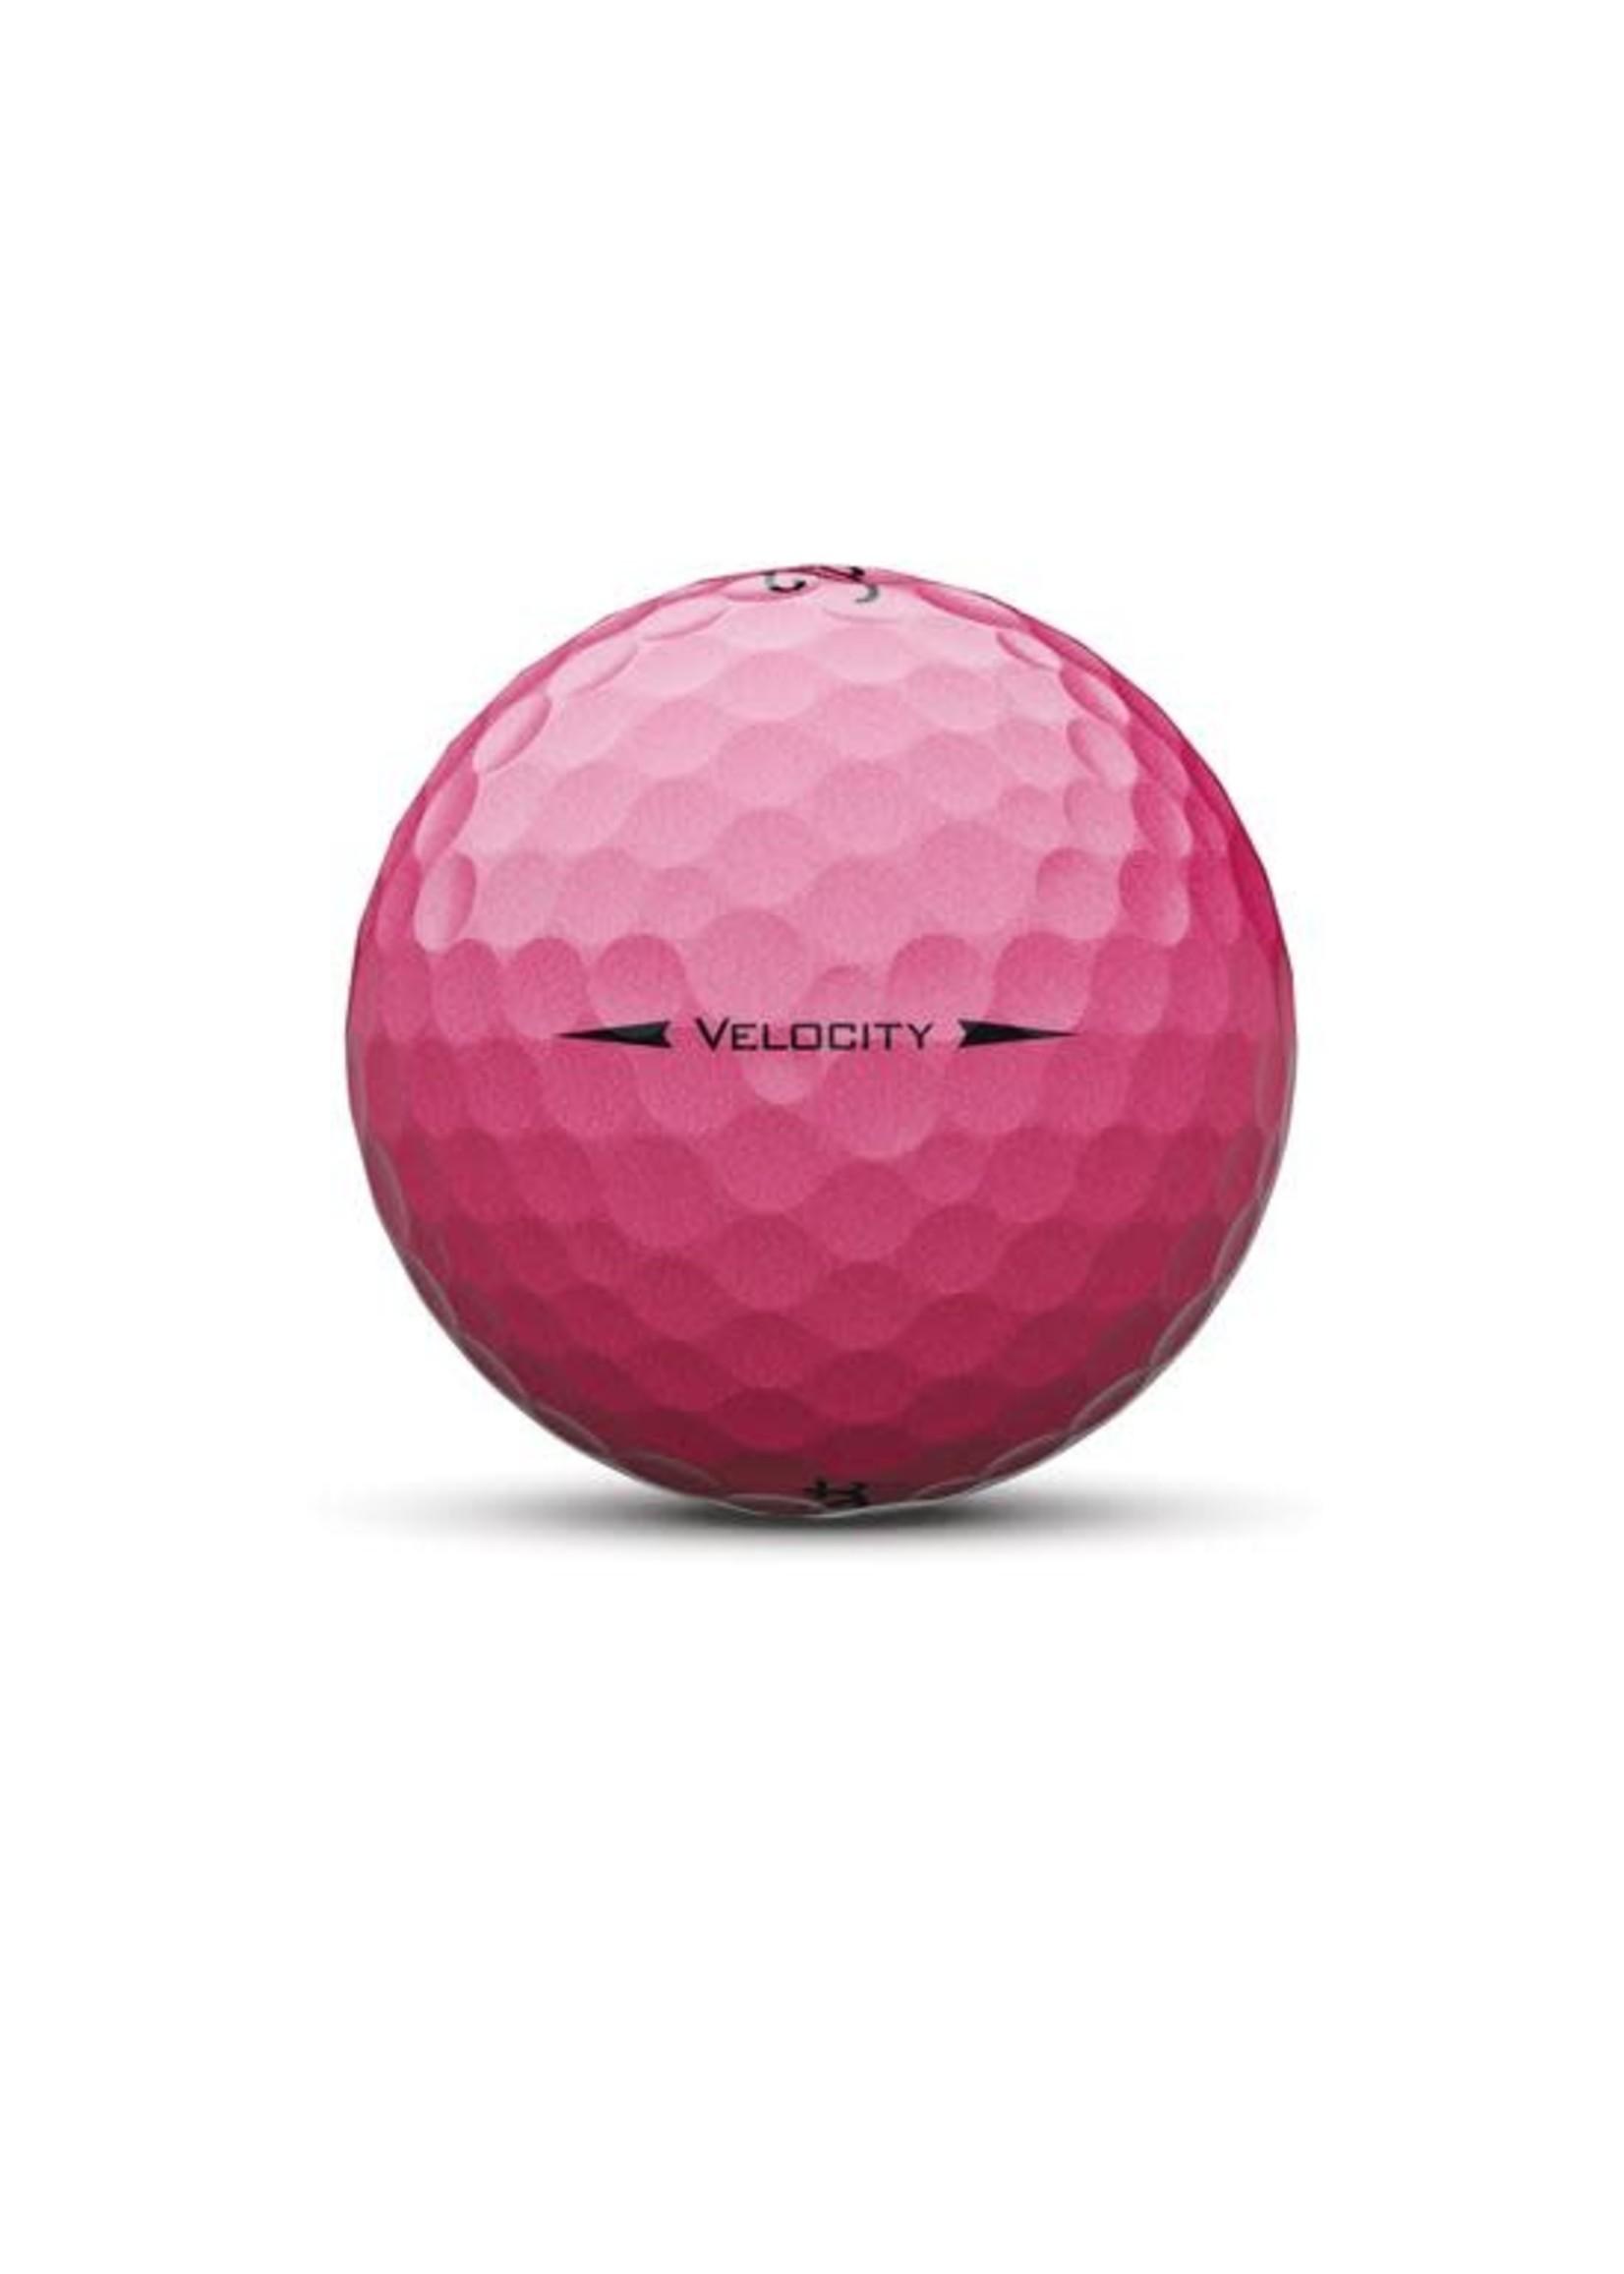 Titleist Titleist Velocity Dozen Pack Golf Balls (2020) - Pink